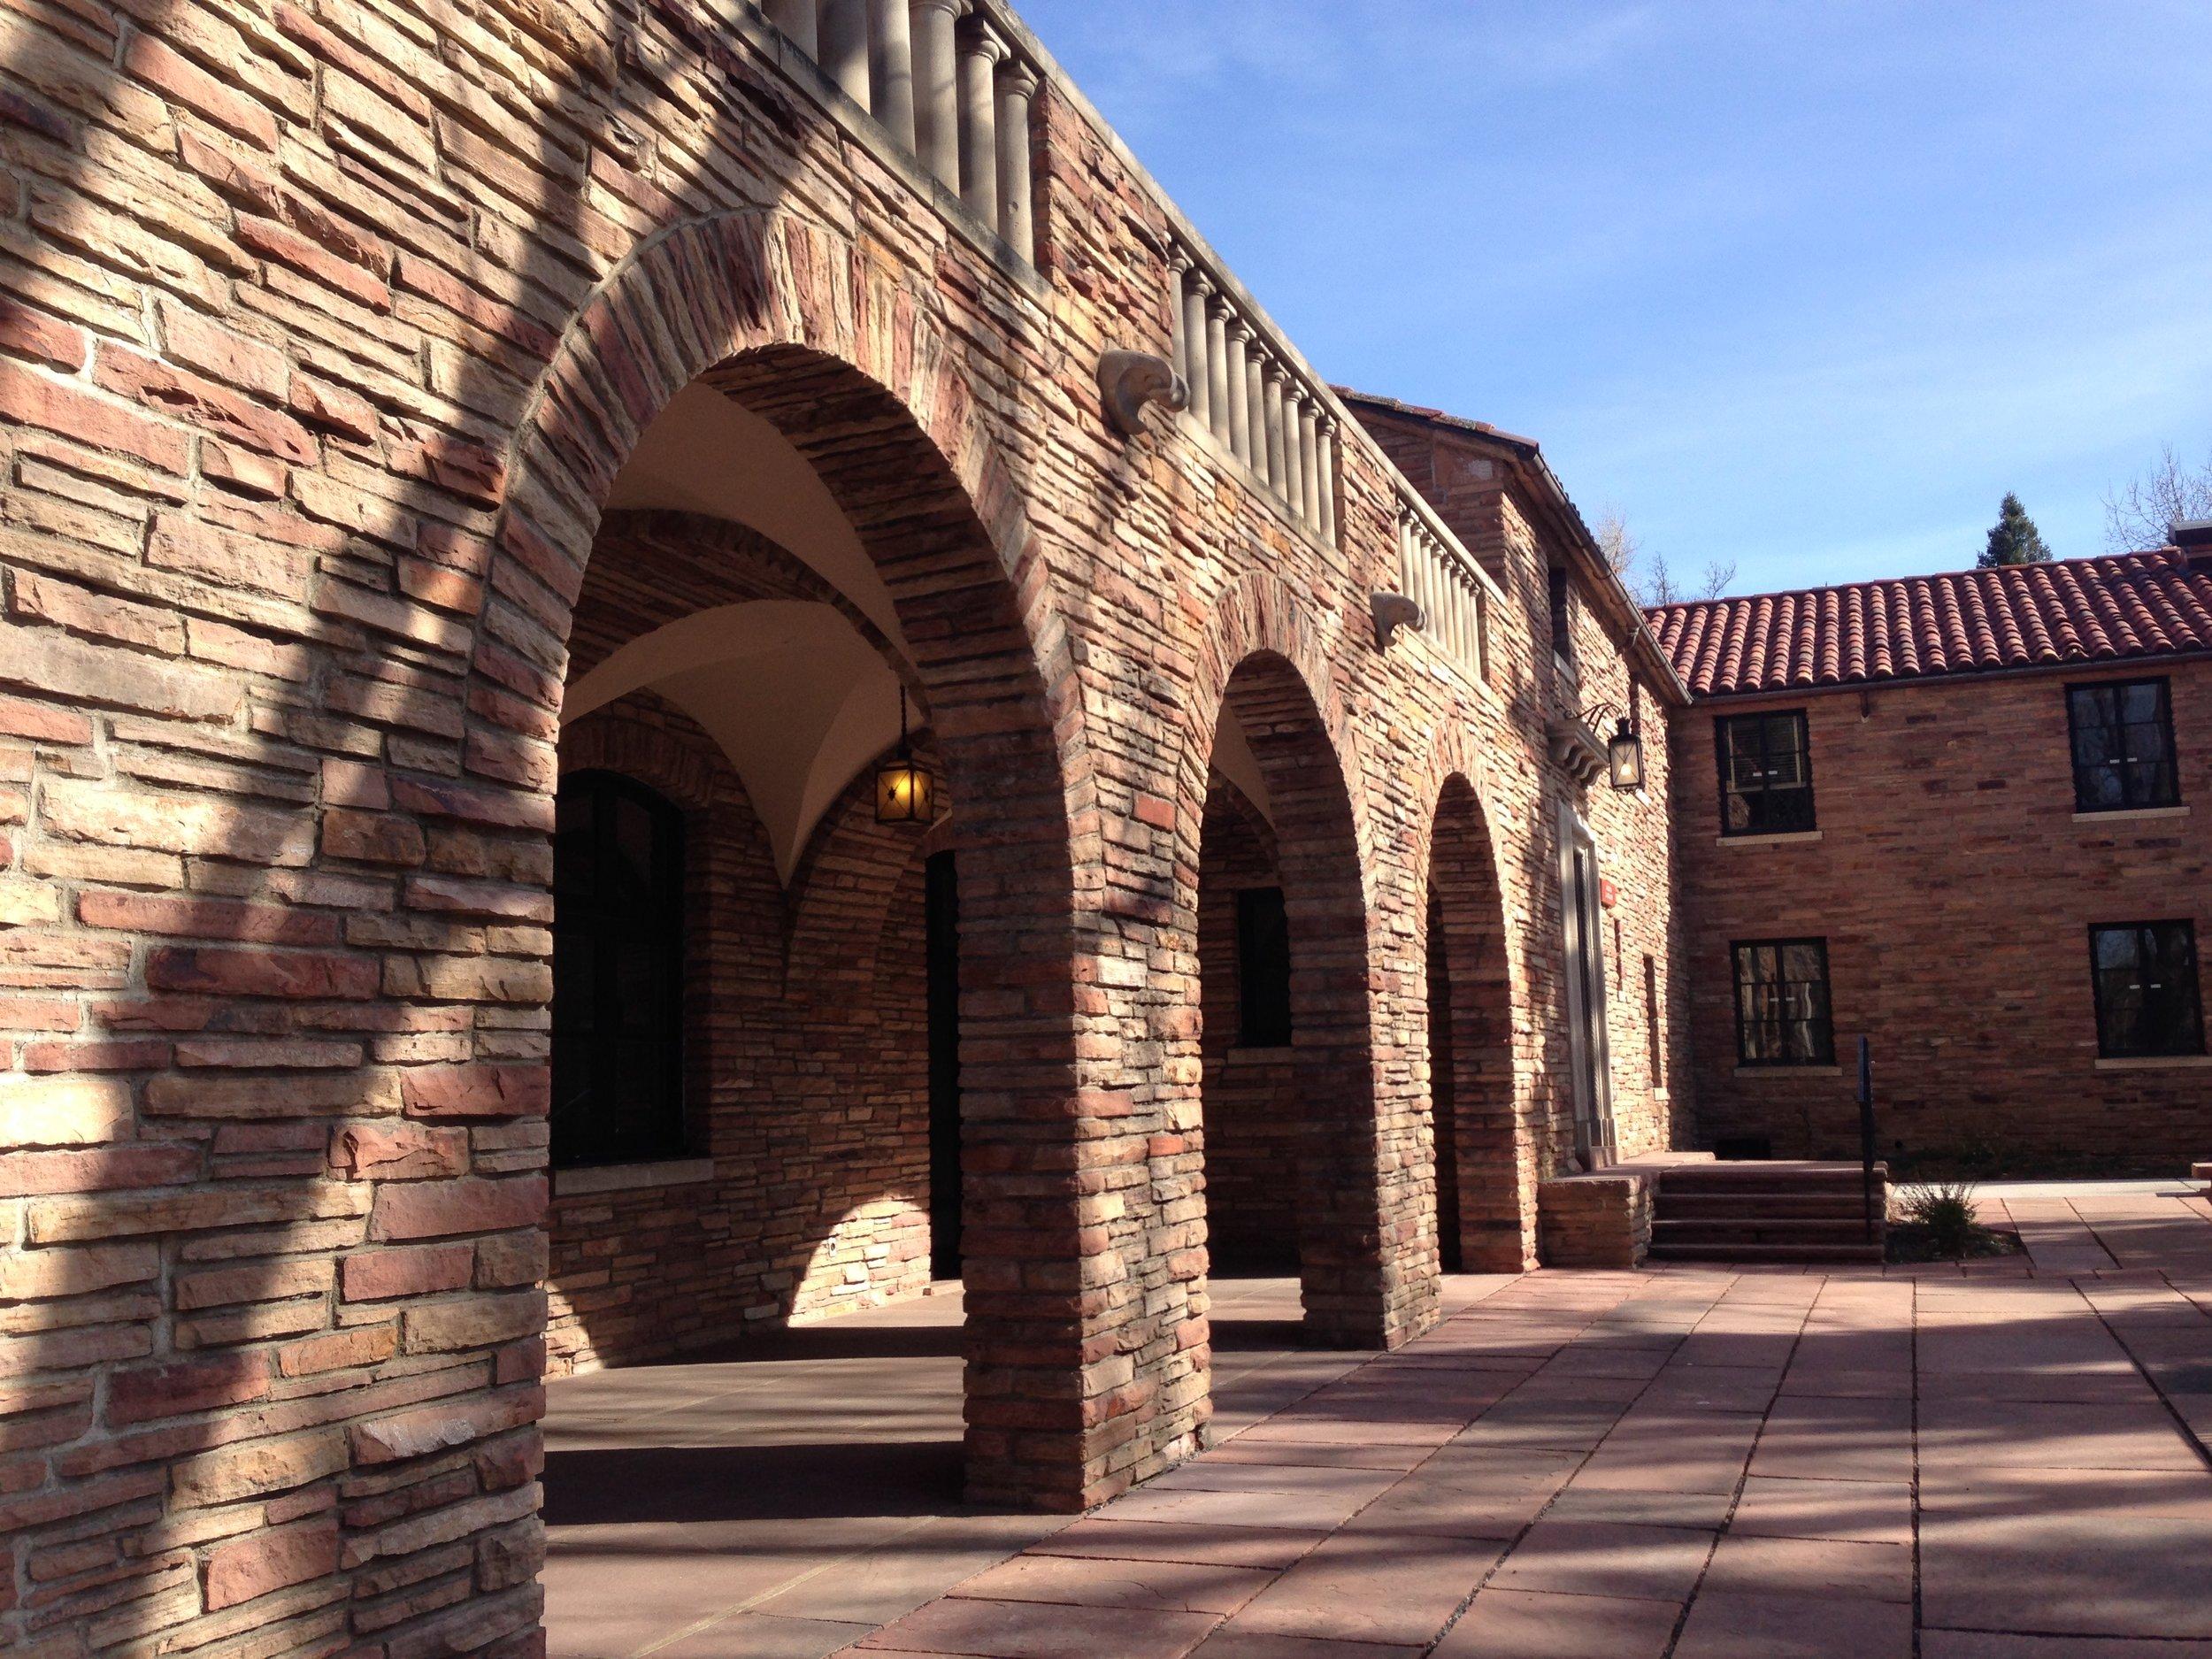 courtyards at CU Boulder